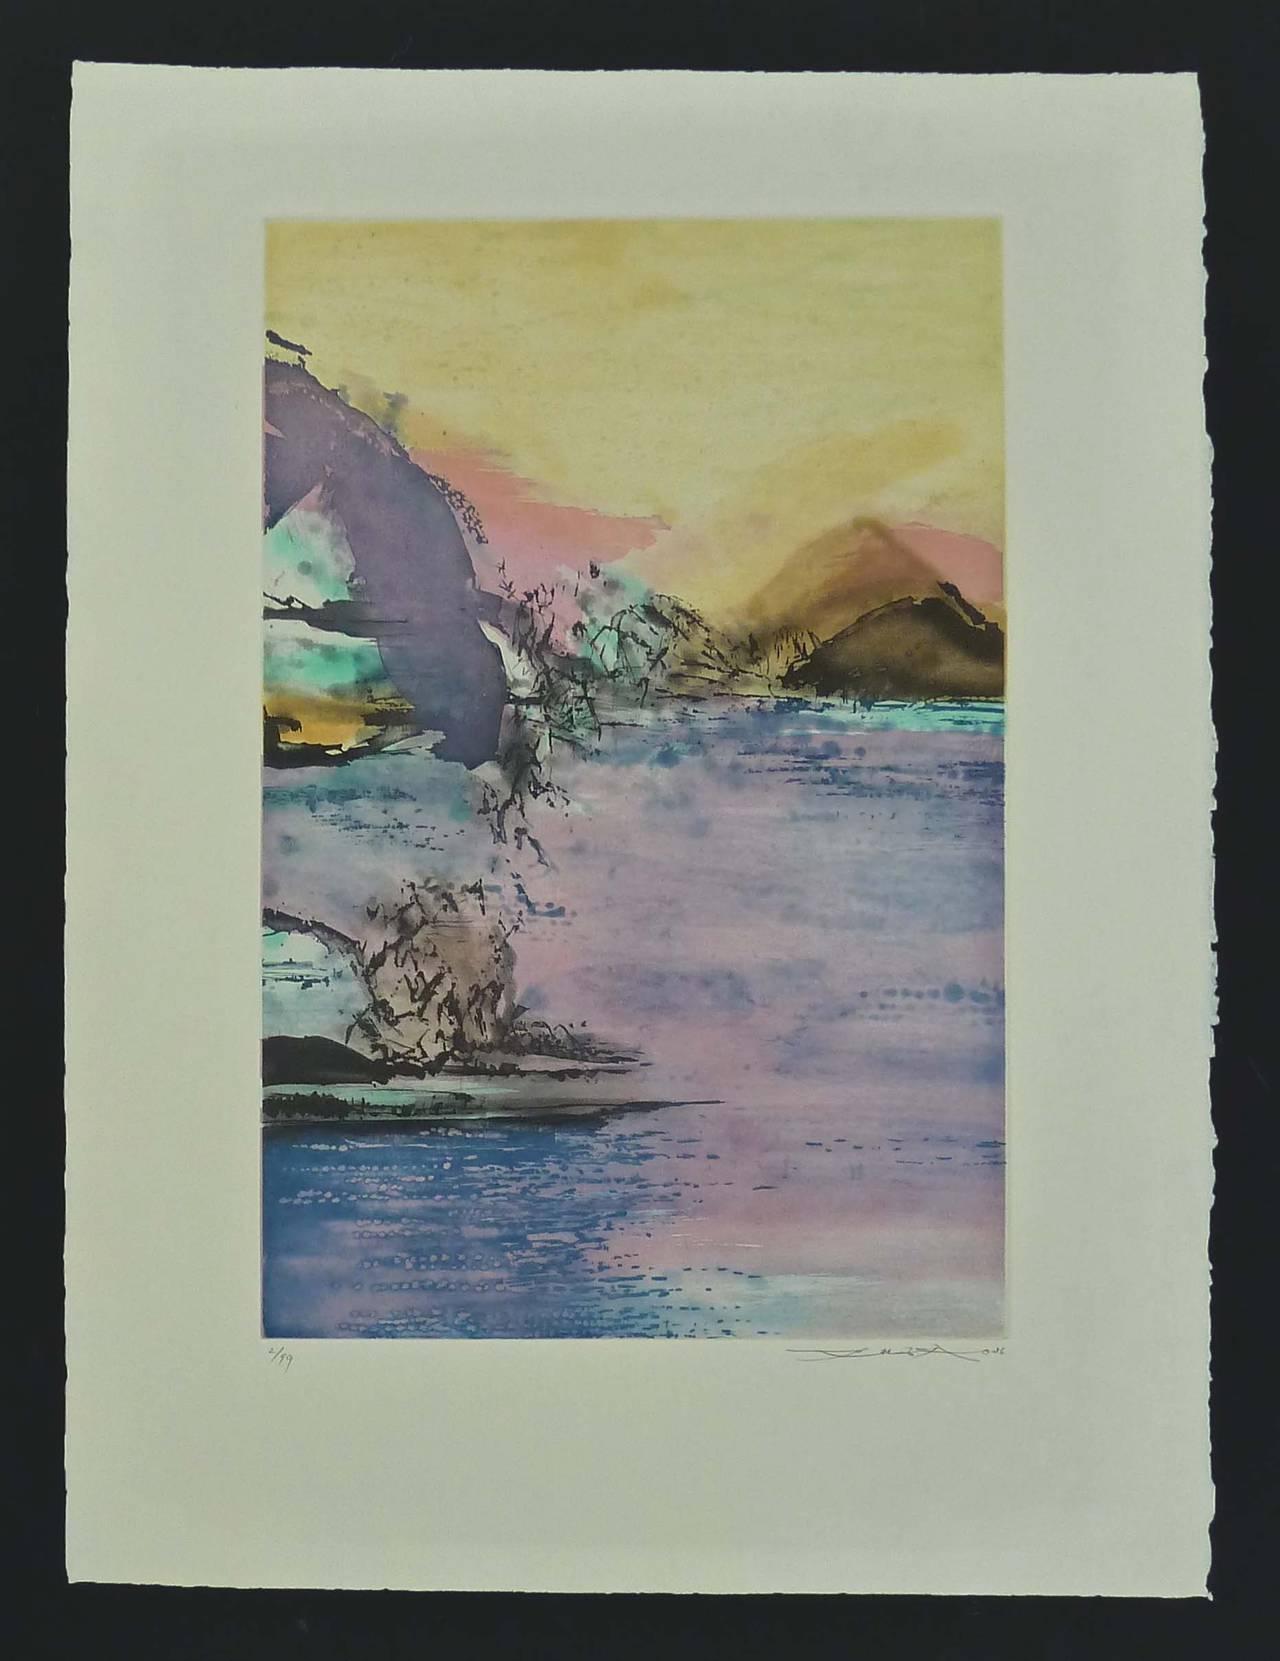 Etching No. 327 - Print by Zao Wou-Ki